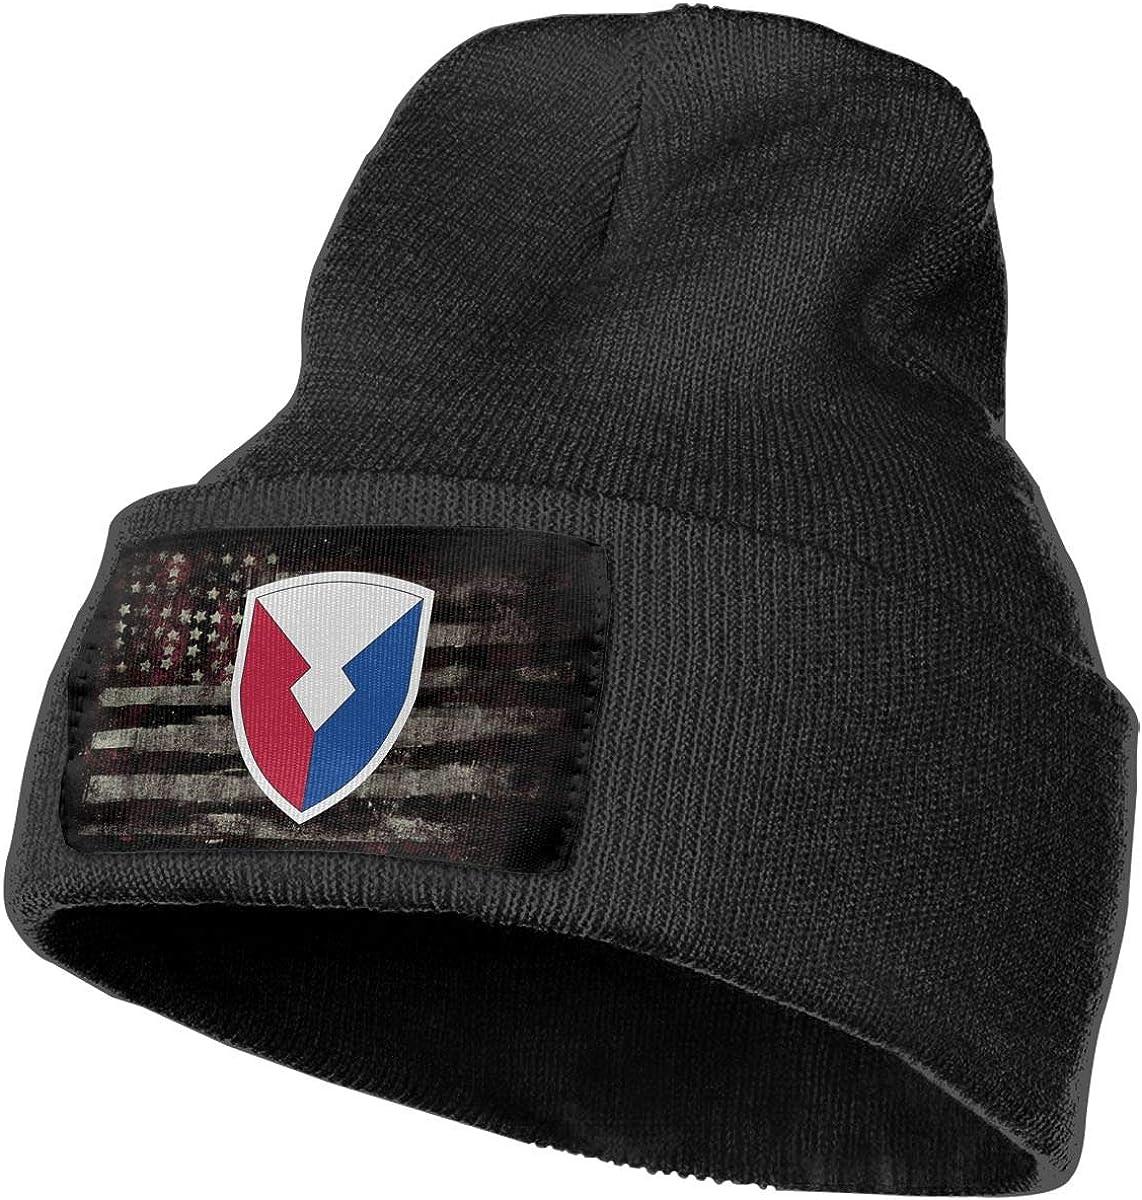 Army Material Command Mens Beanie Cap Skull Cap Winter Warm Knitting Hats.